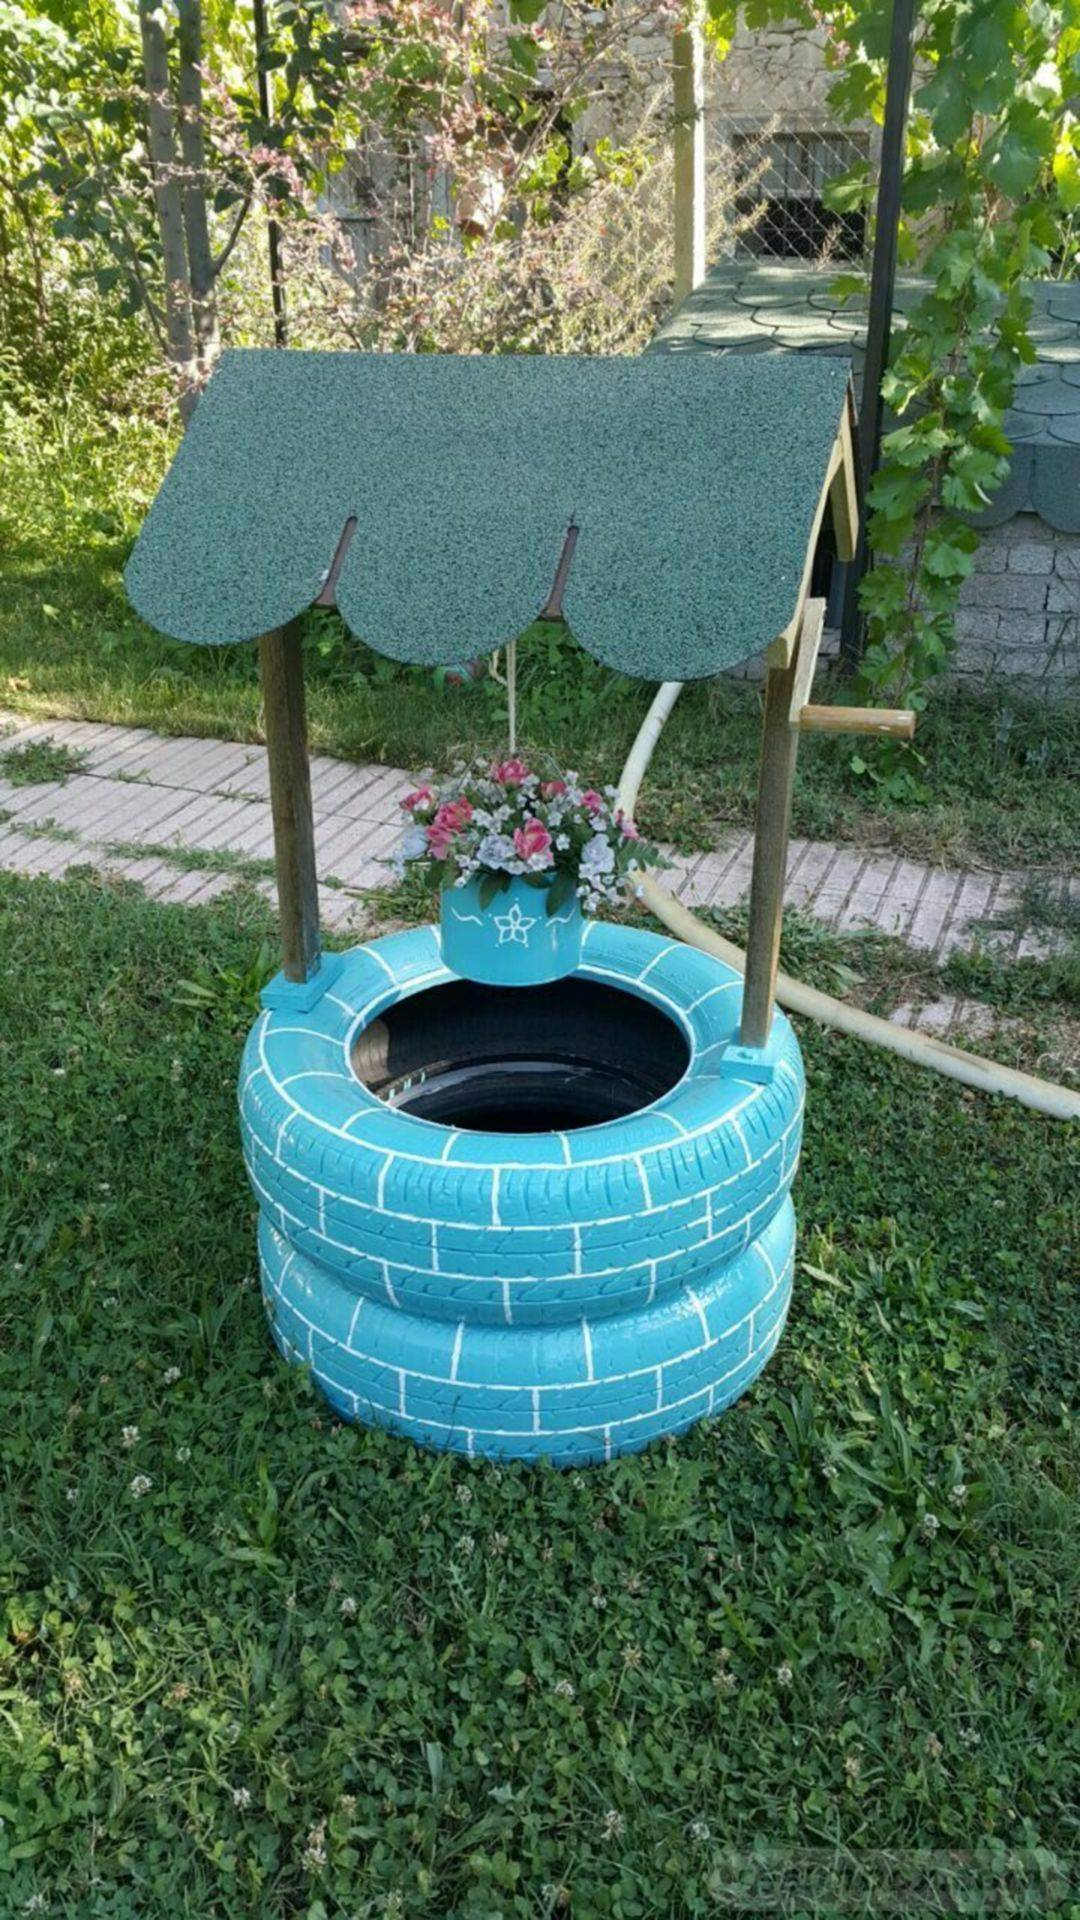 amazing garden ideas-462533824227159617